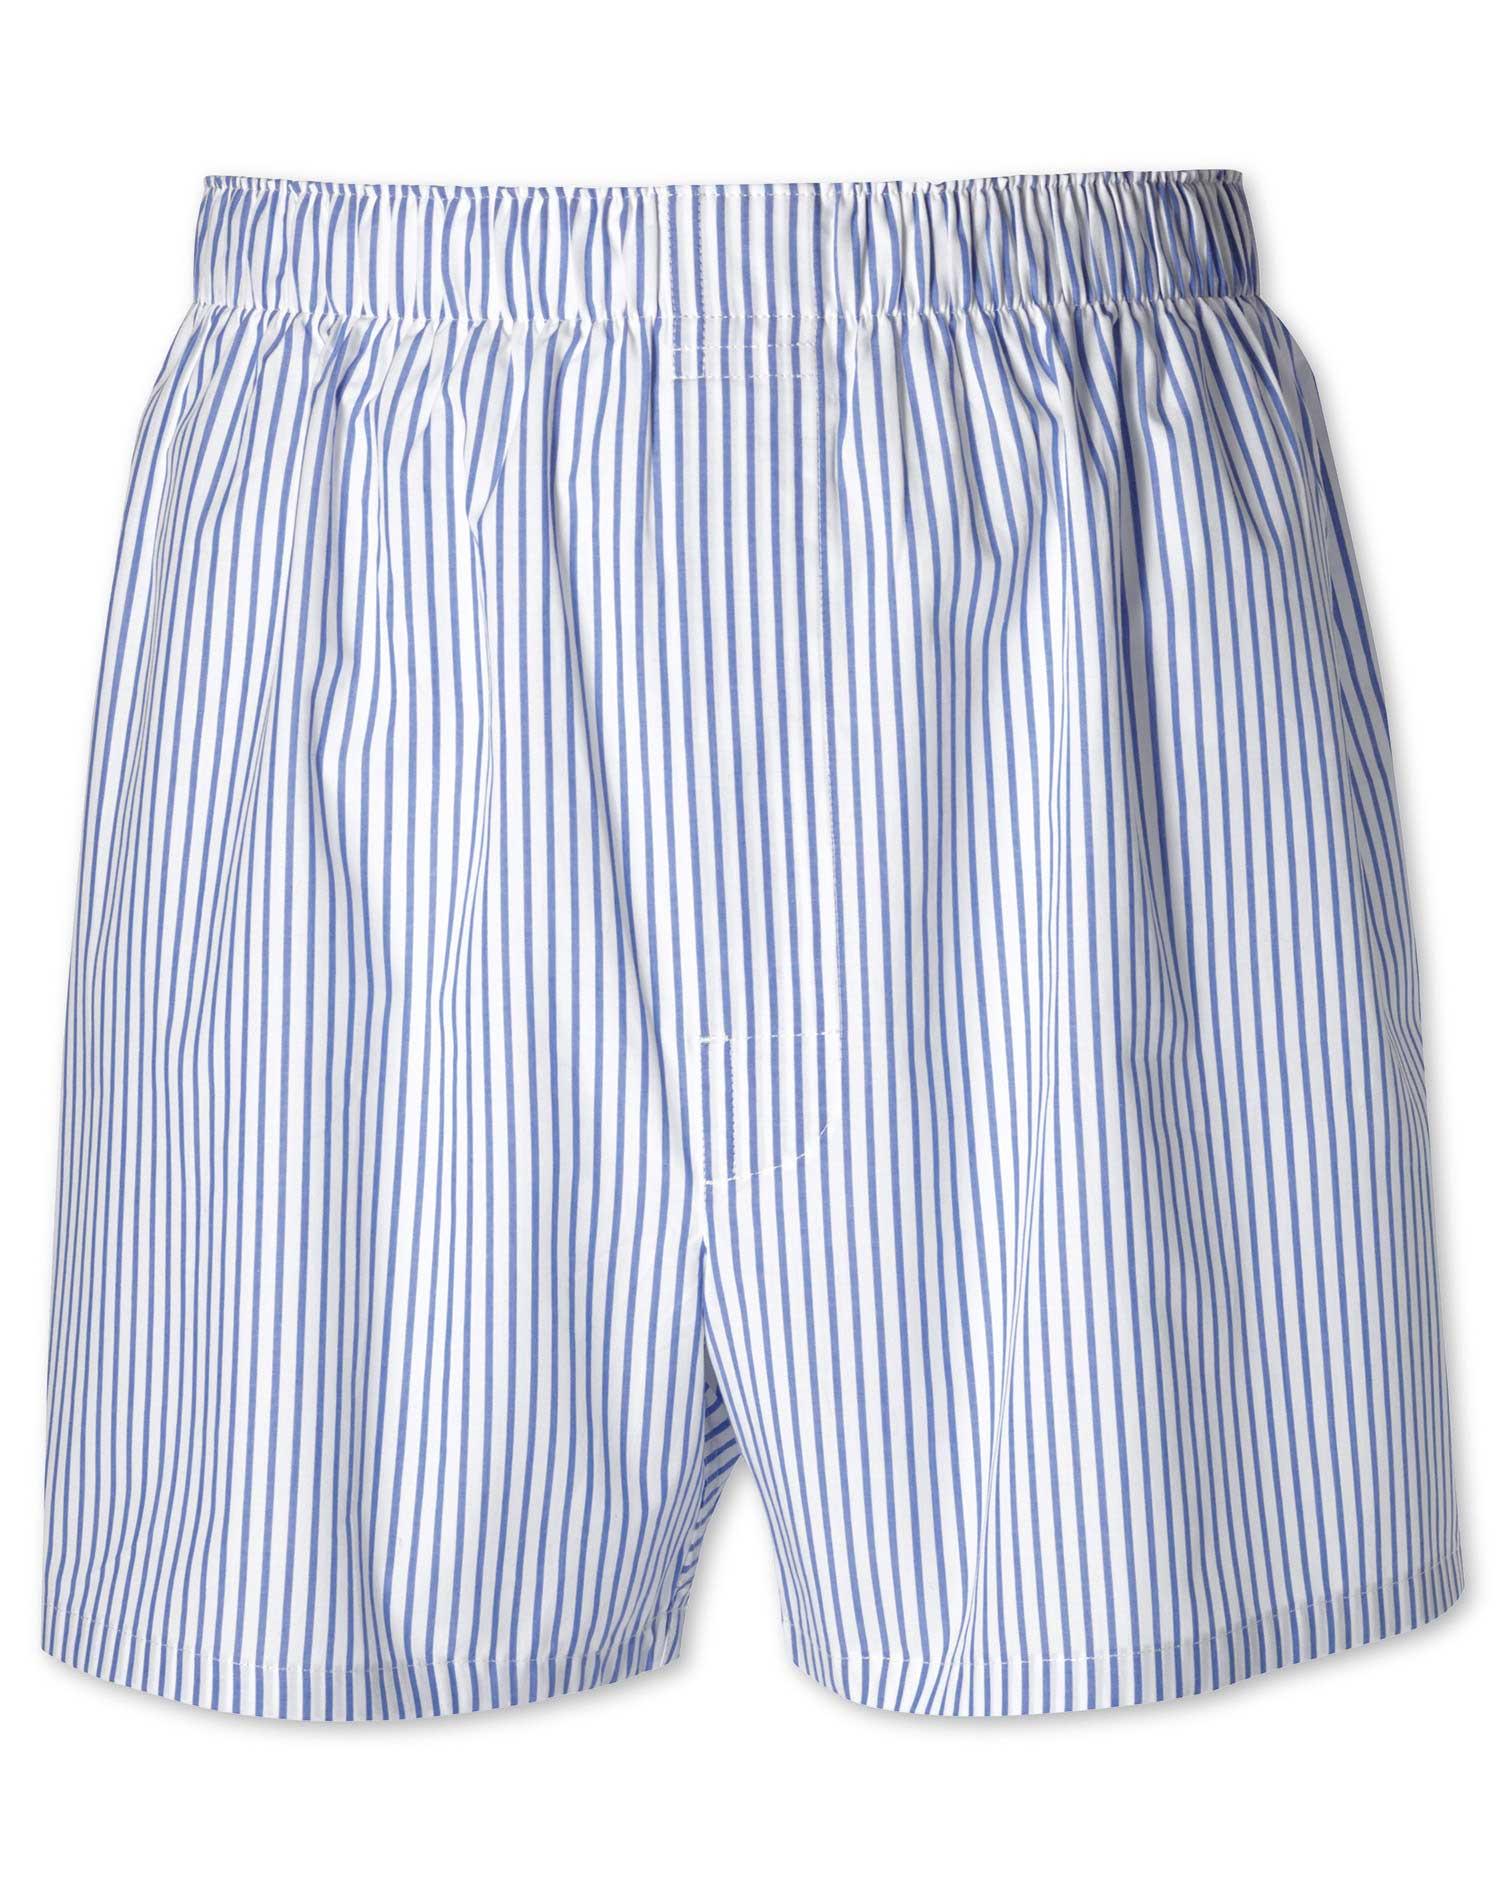 Sky Blue Stripe Woven Boxers Size XXL by Charles Tyrwhitt